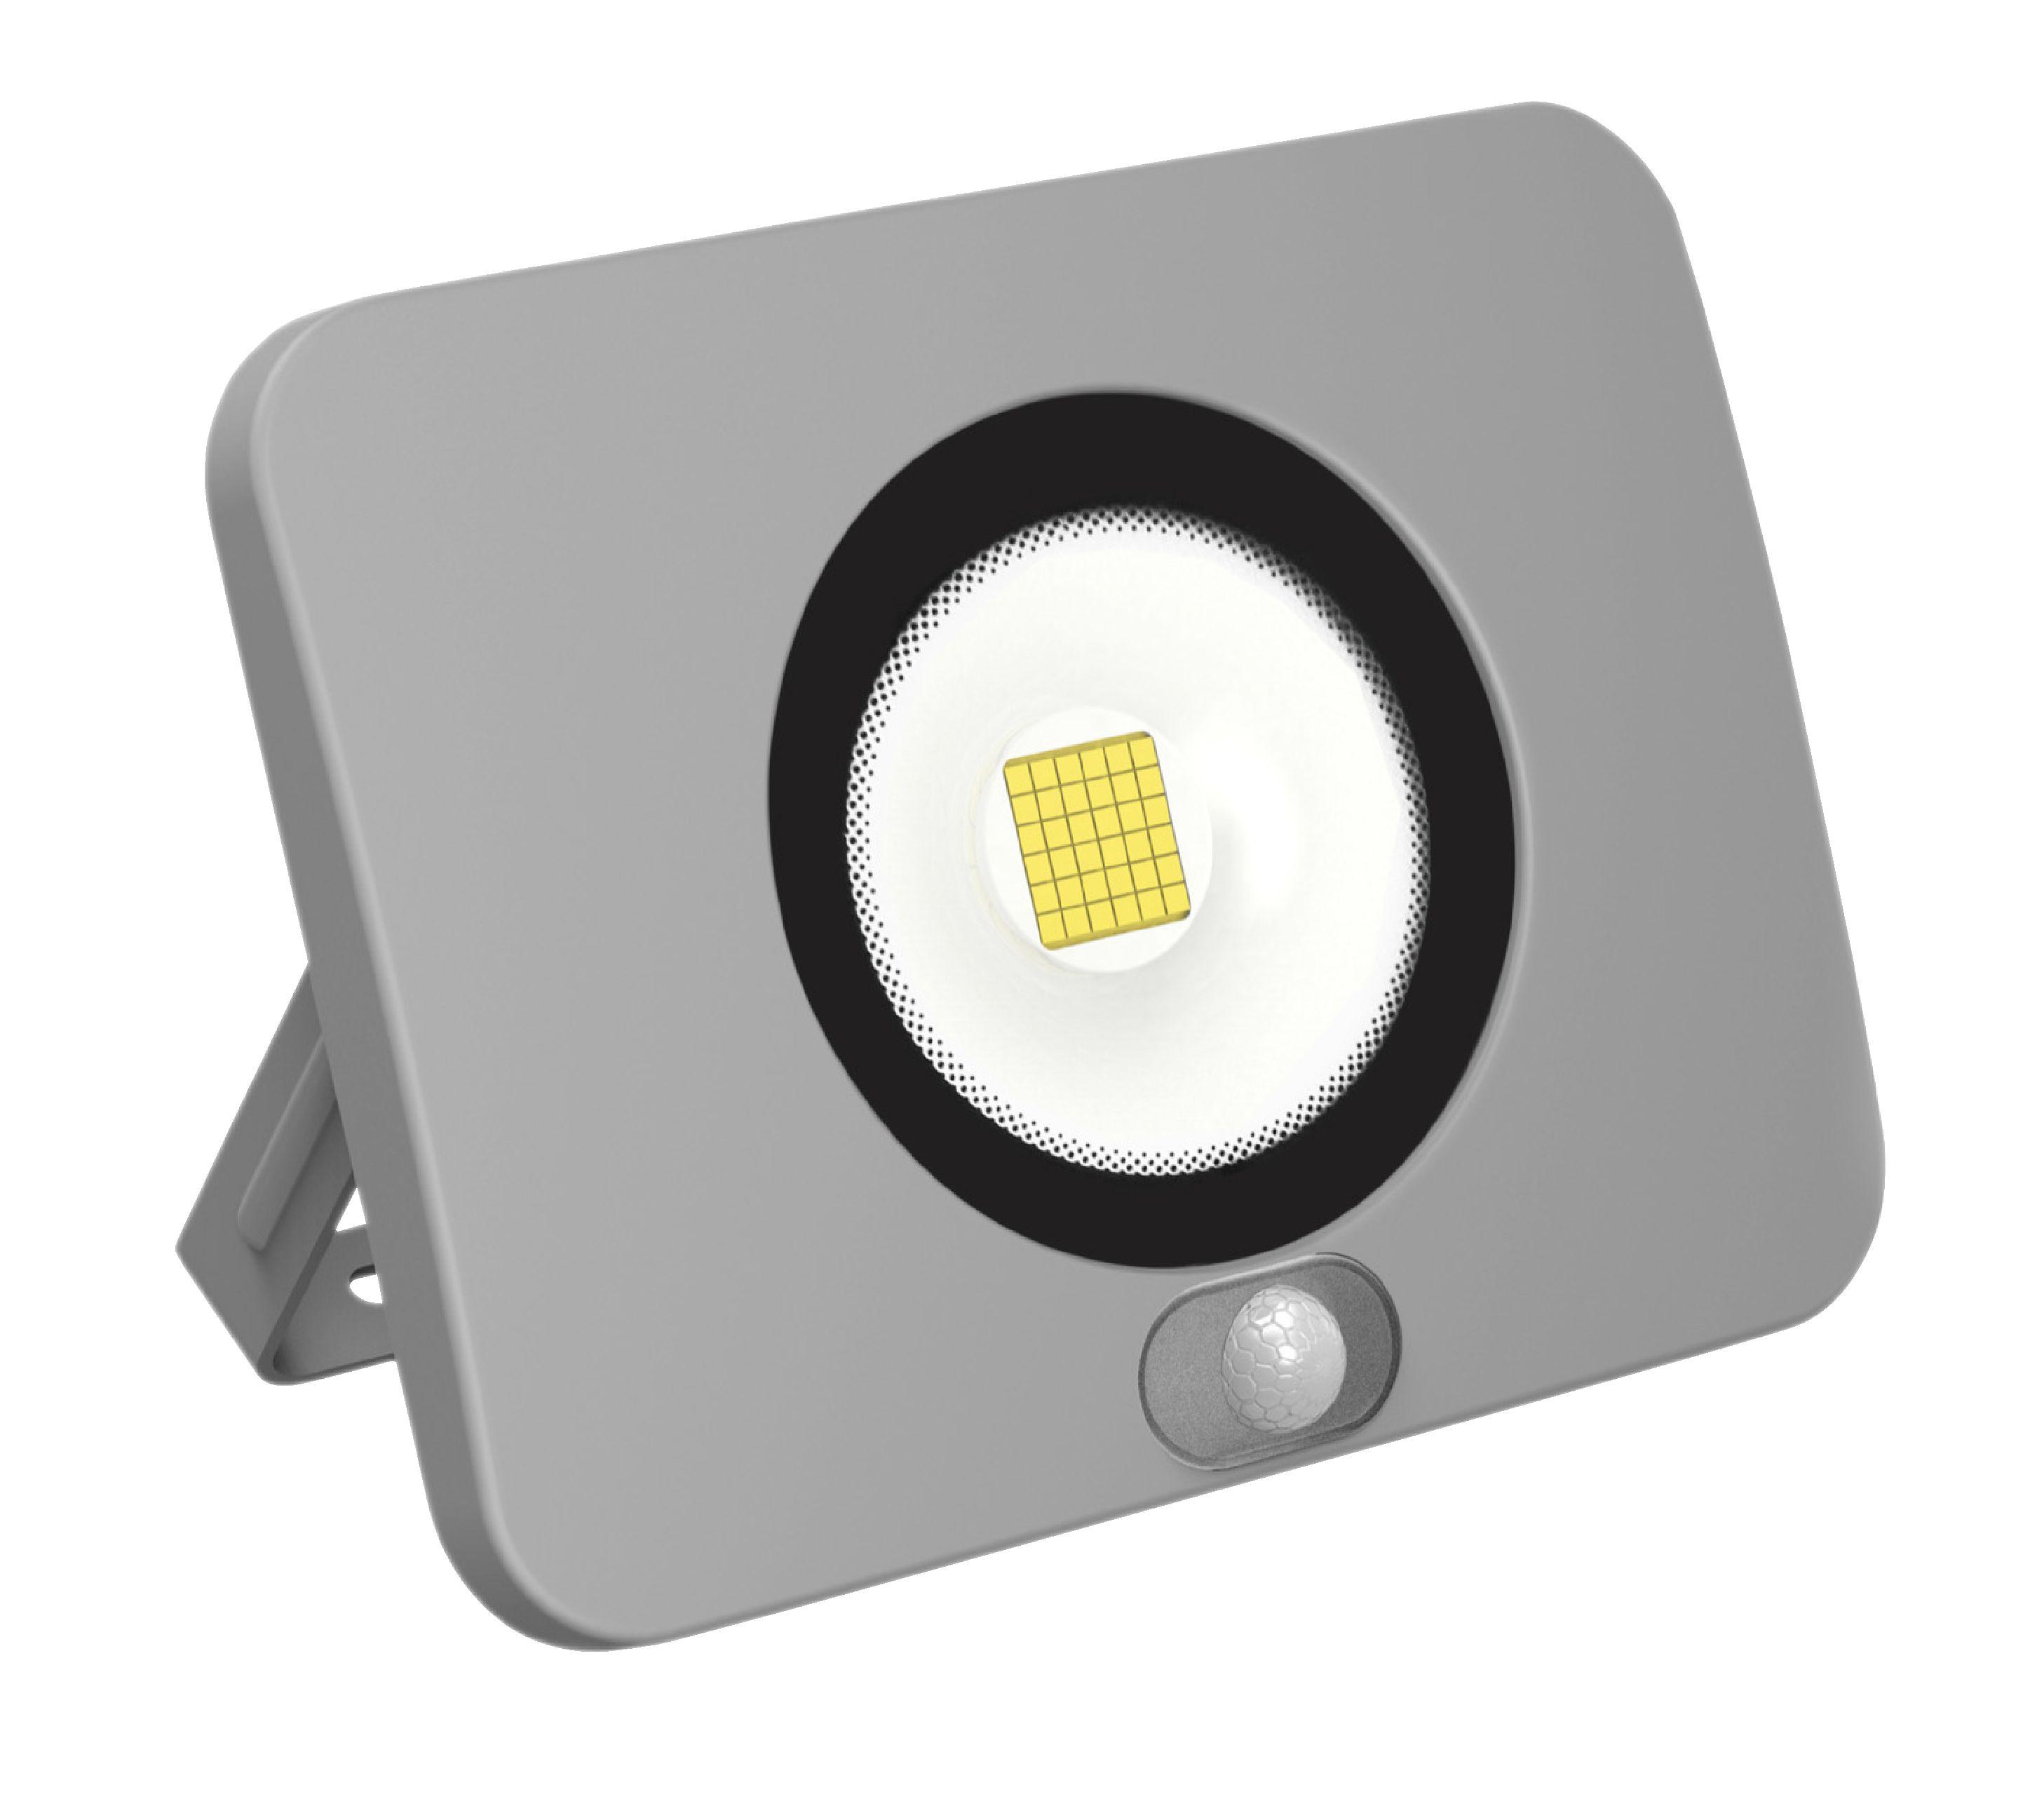 Century SHSLIS-309540 LED reflektor 30 W 2240 lm s čidlem pohybu